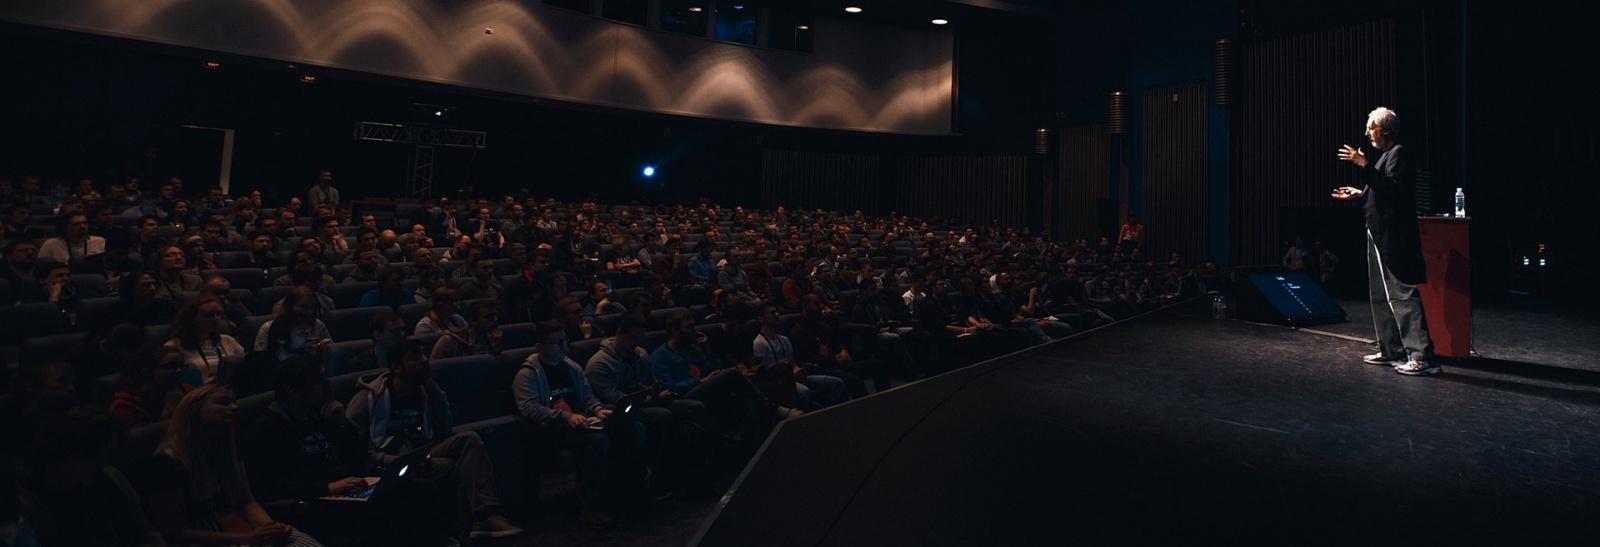 Анонс конференции HolyJS 2017 Moscow: Два дня чистого JS - 1